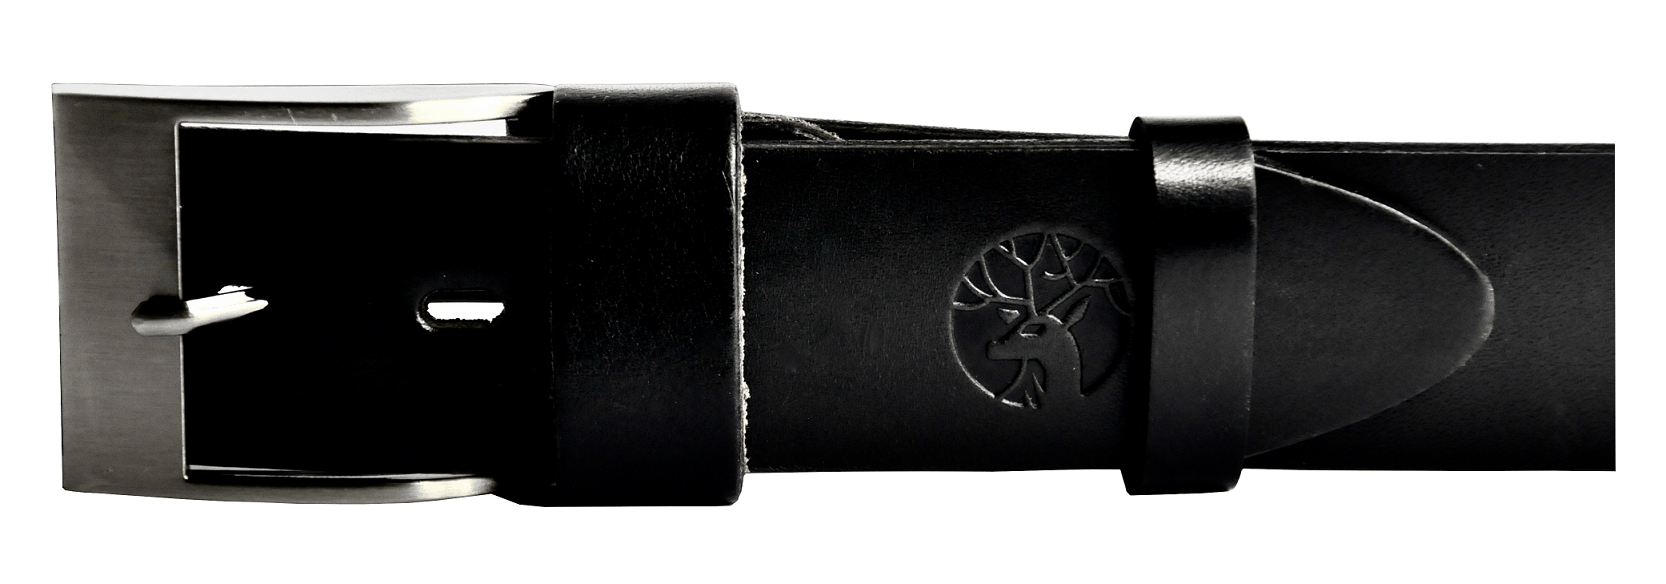 Pasek ze skóry czarny klamra klasyczna szeroki 4 cm (1)